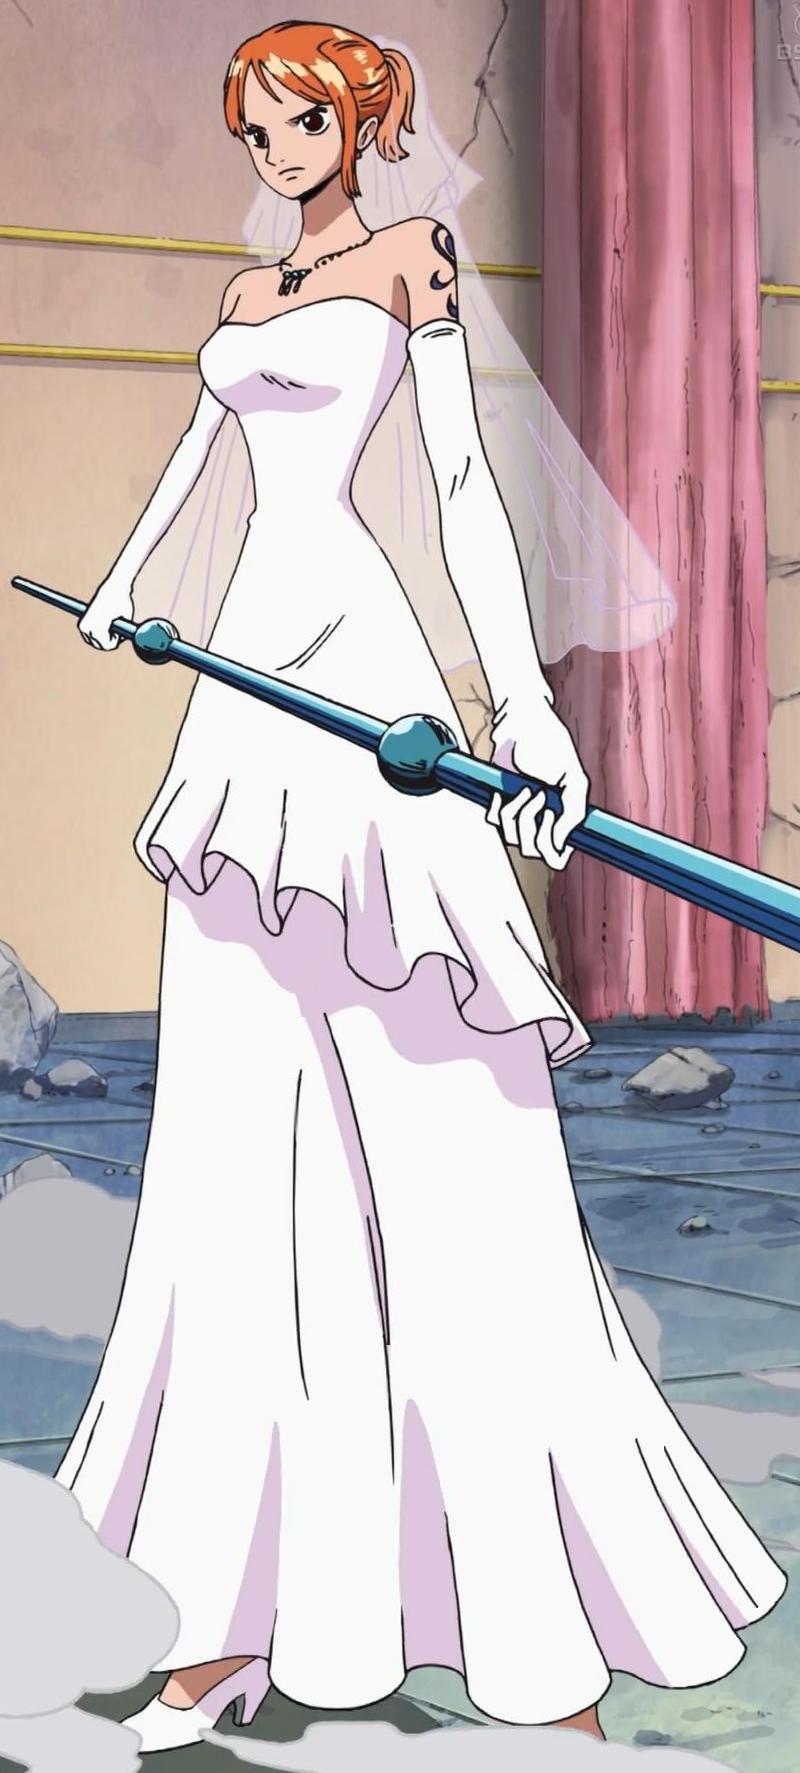 Image - Nami Wedding Gown.png | One Piece Wiki | FANDOM powered by Wikia